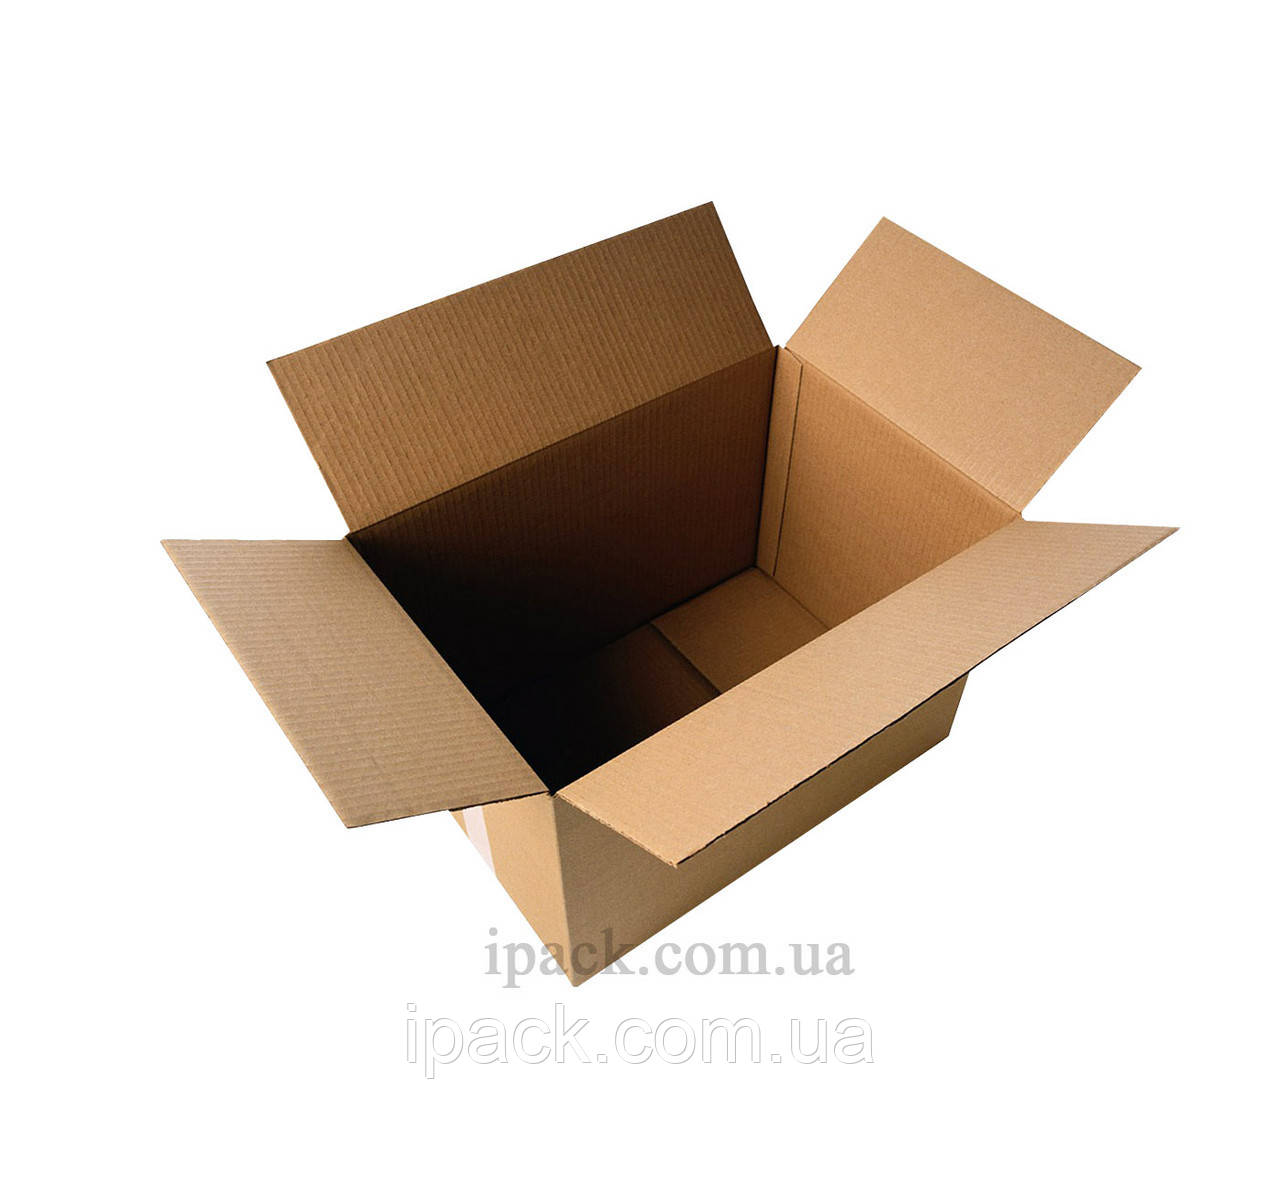 Гофроящик 485*295*195 мм, бурый, четырехклапанный картонный короб